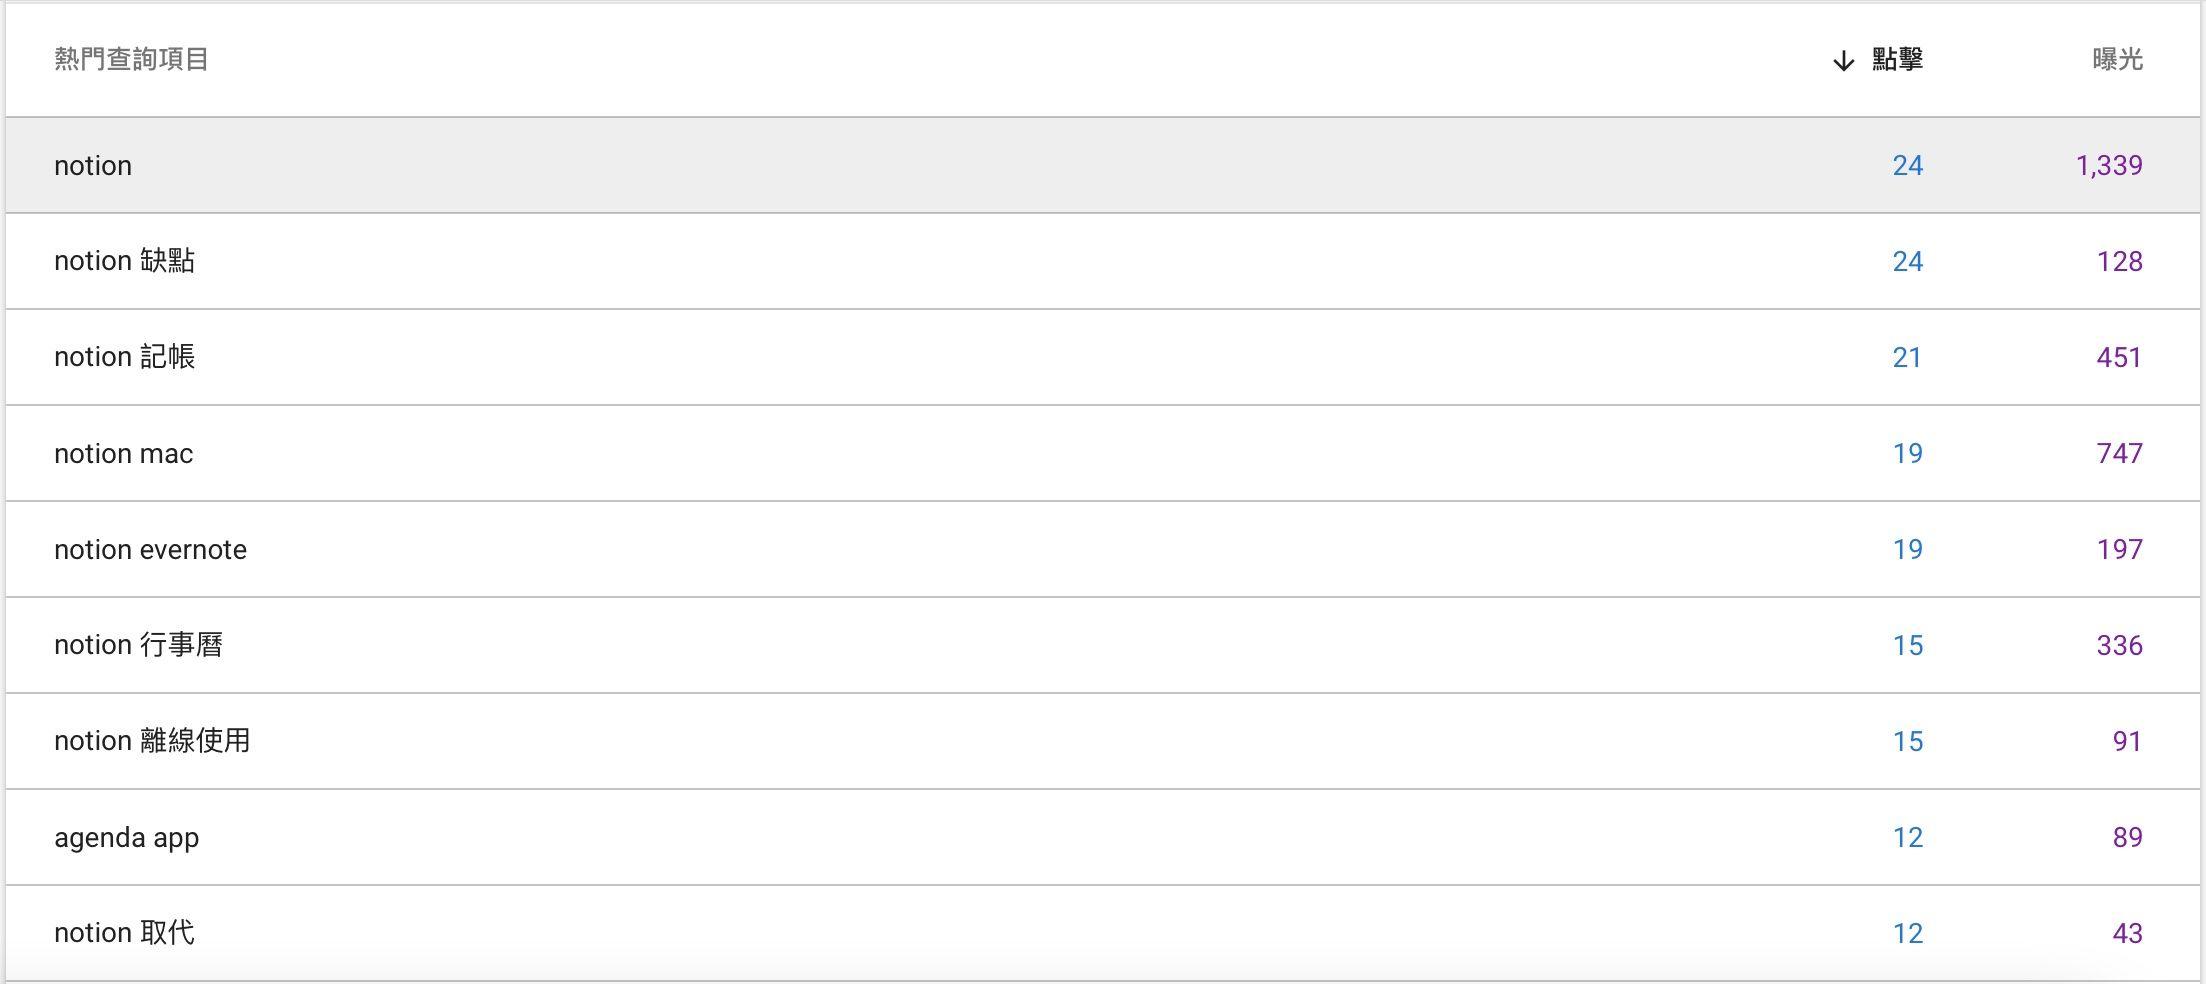 Google Search Console 有幾個令人注目的關鍵字